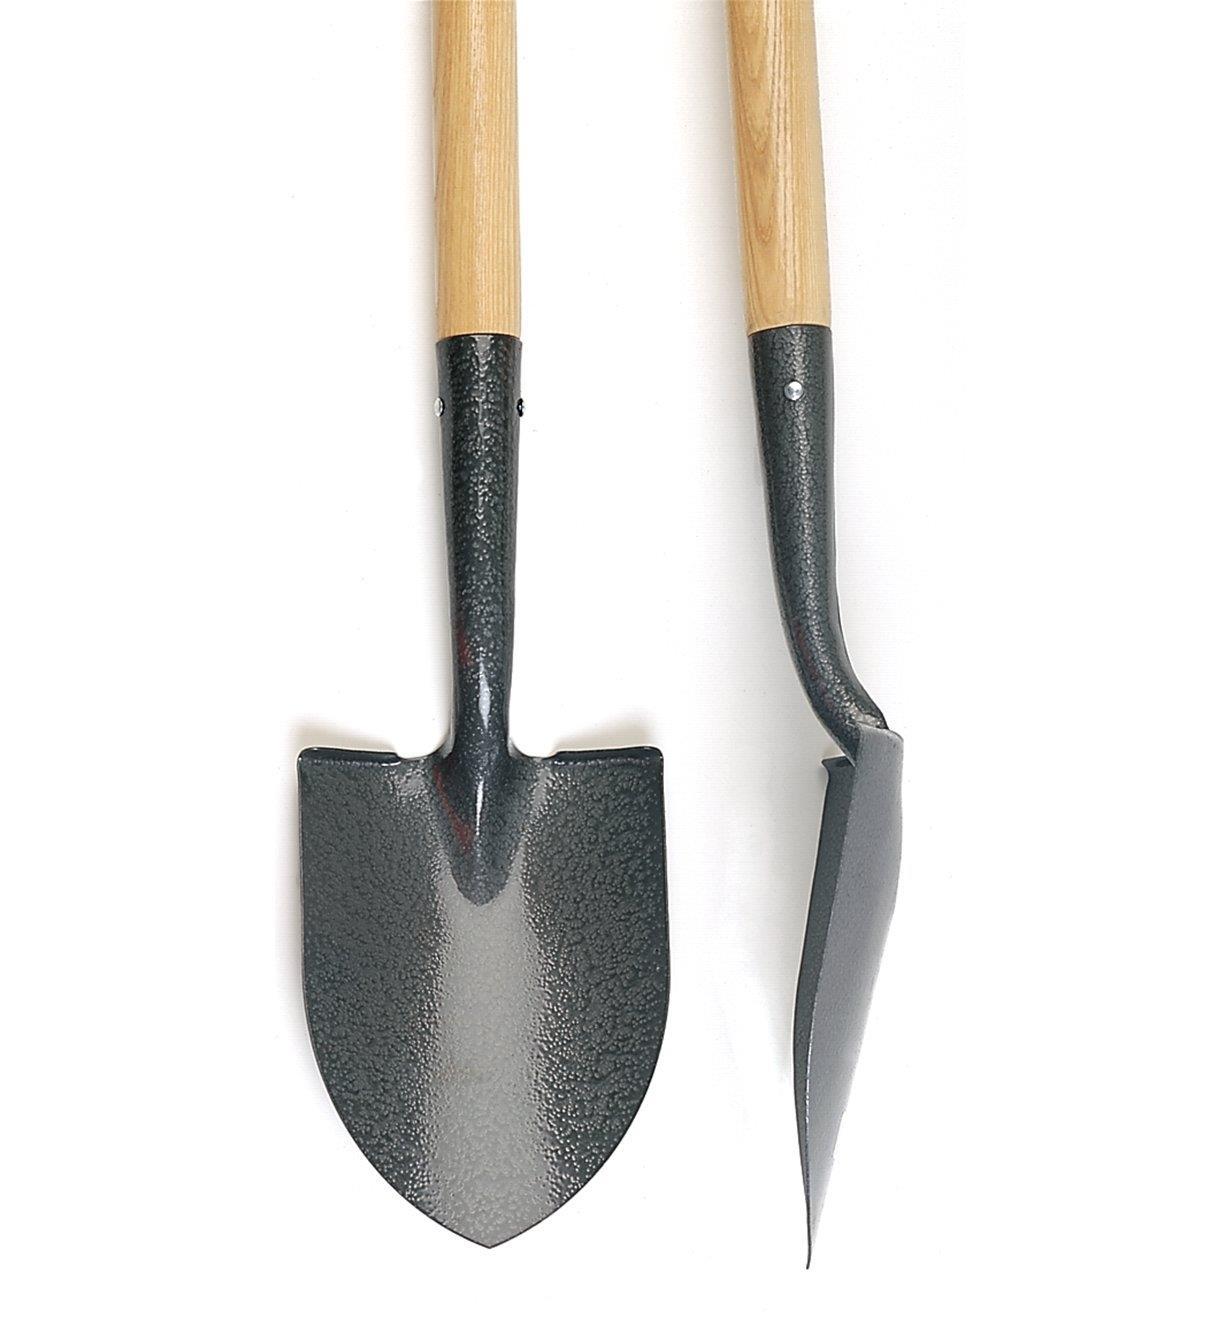 PA821 - Floral Shovel